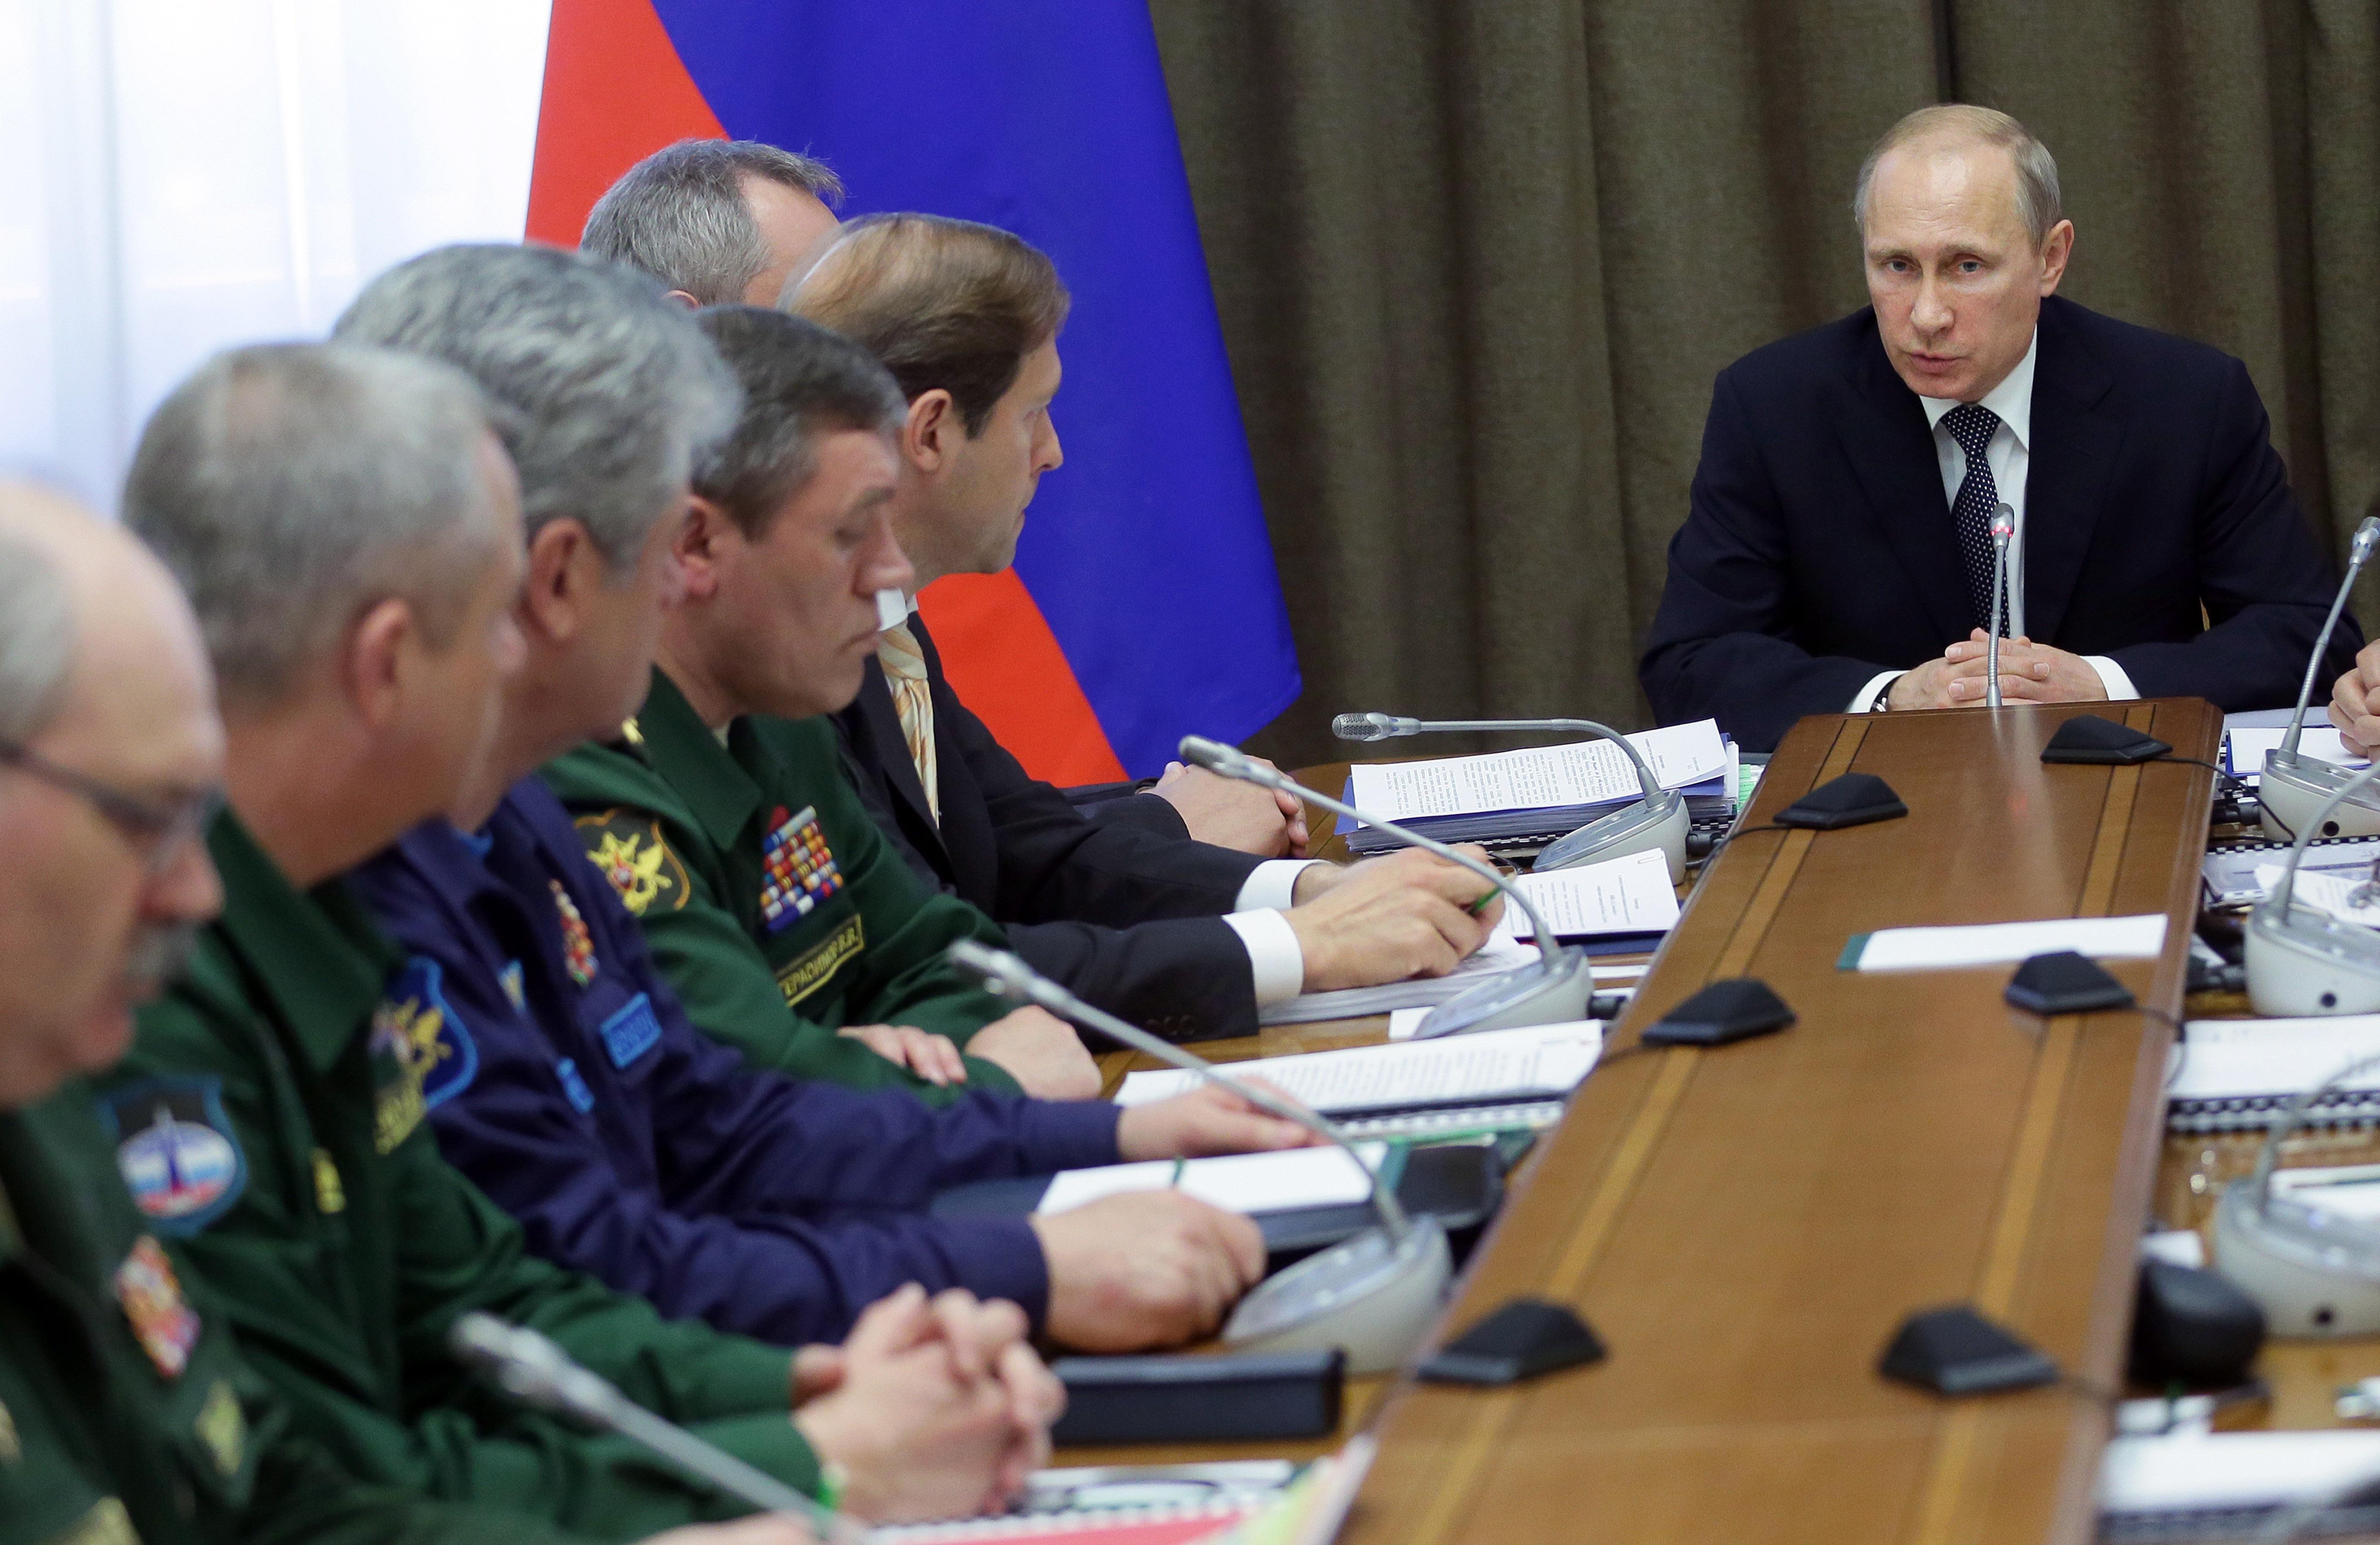 Владимир Путин во время совещания по госпрограмме вооружений